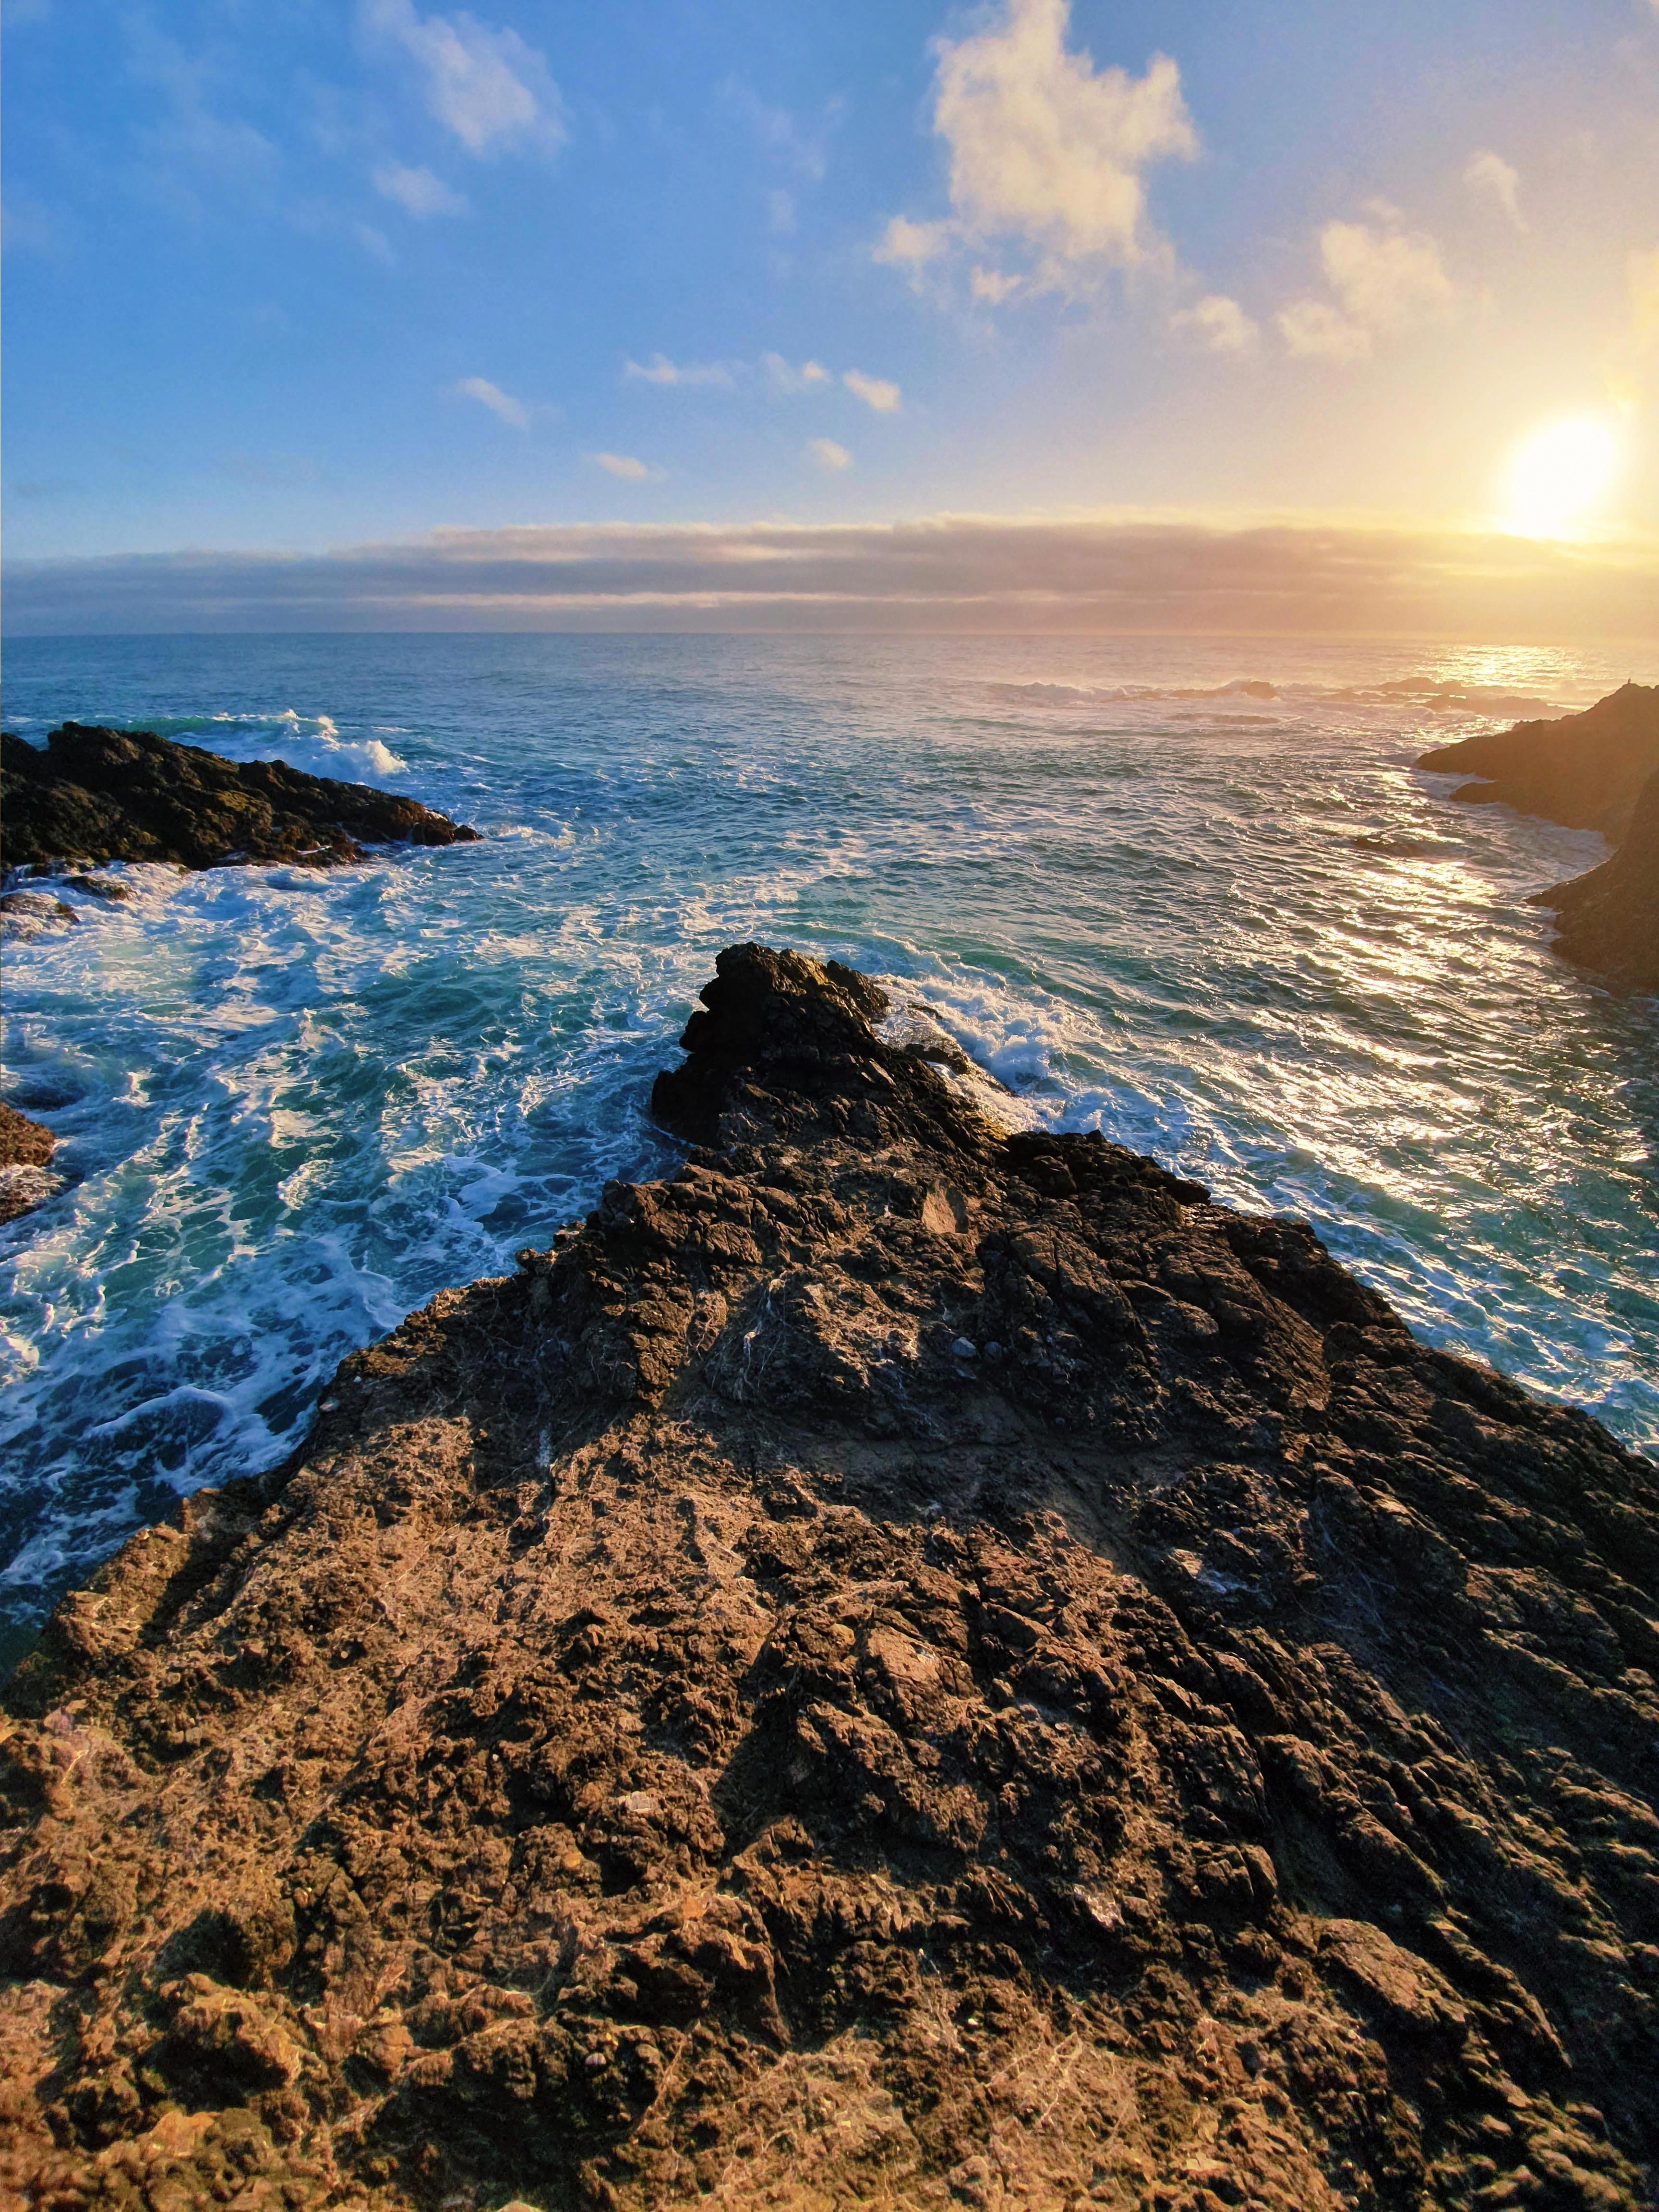 Headlands of mendocino california usa oc 3456 4608